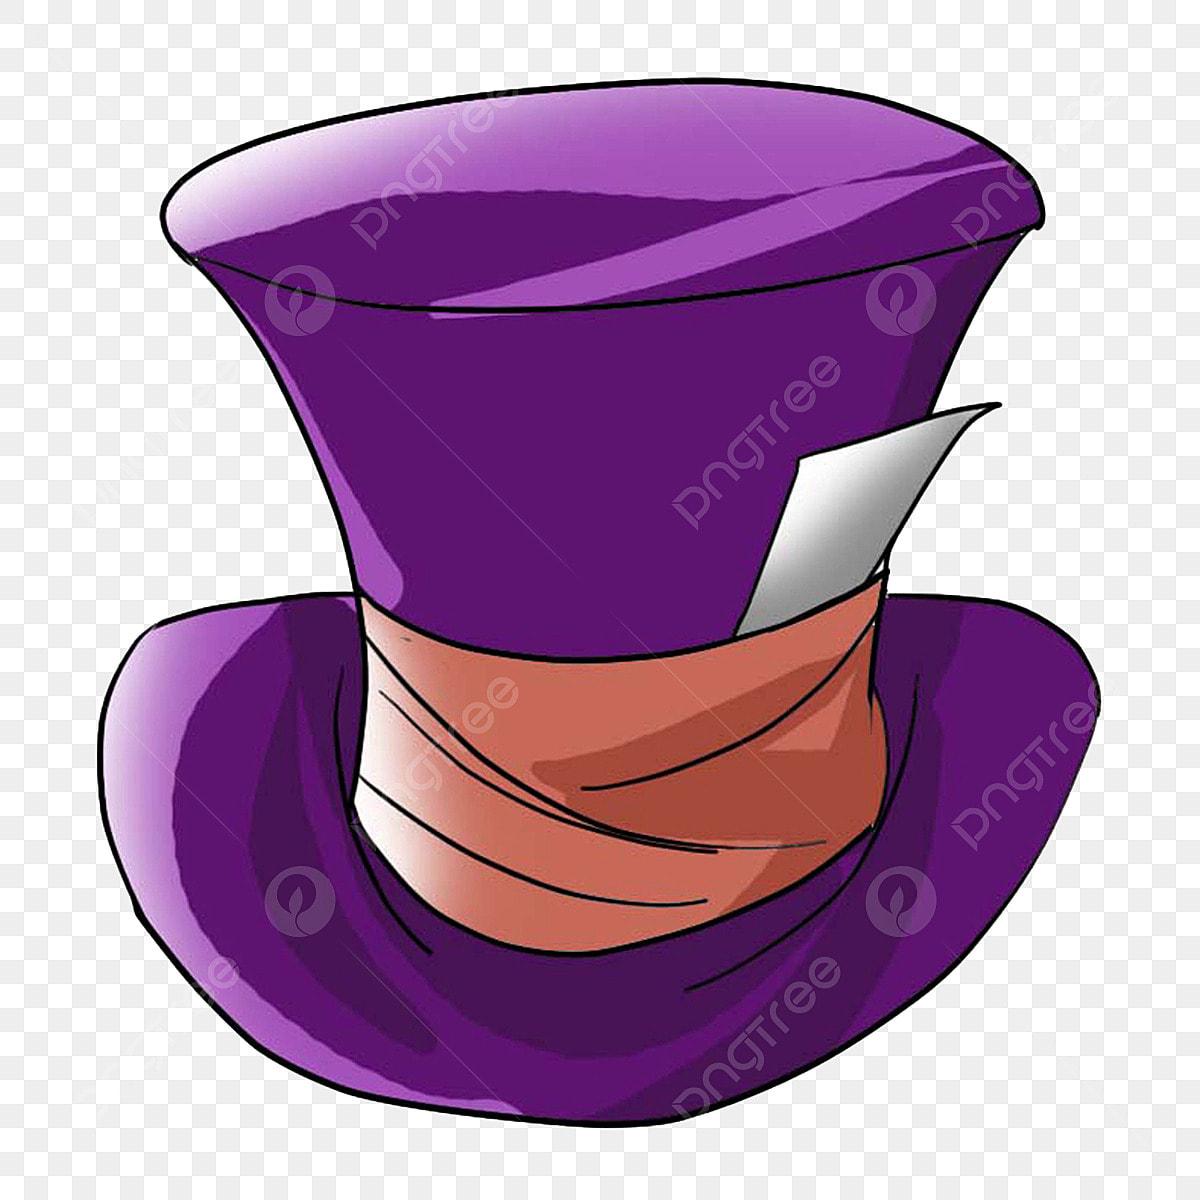 Illustration Mad Hatter Hat Madhatter Illustration Drawing Png Transparent Clipart Image And Psd File For Free Download